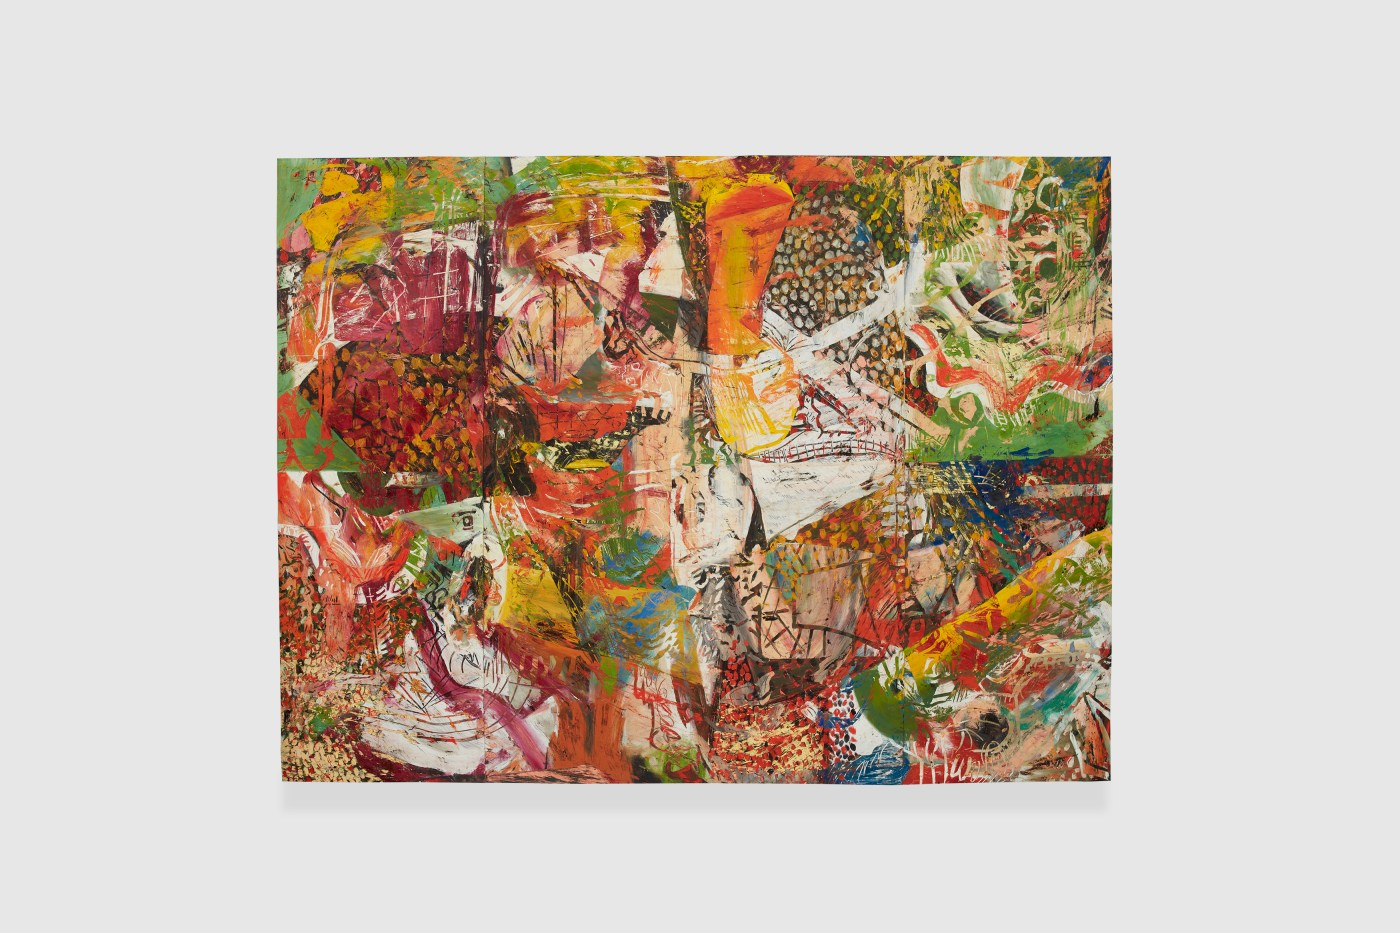 Lehmann Maupin - Angel Otero, Window Seat,2019 100,000美元 , 圖片由 Sotheby's Gallery Network 提供